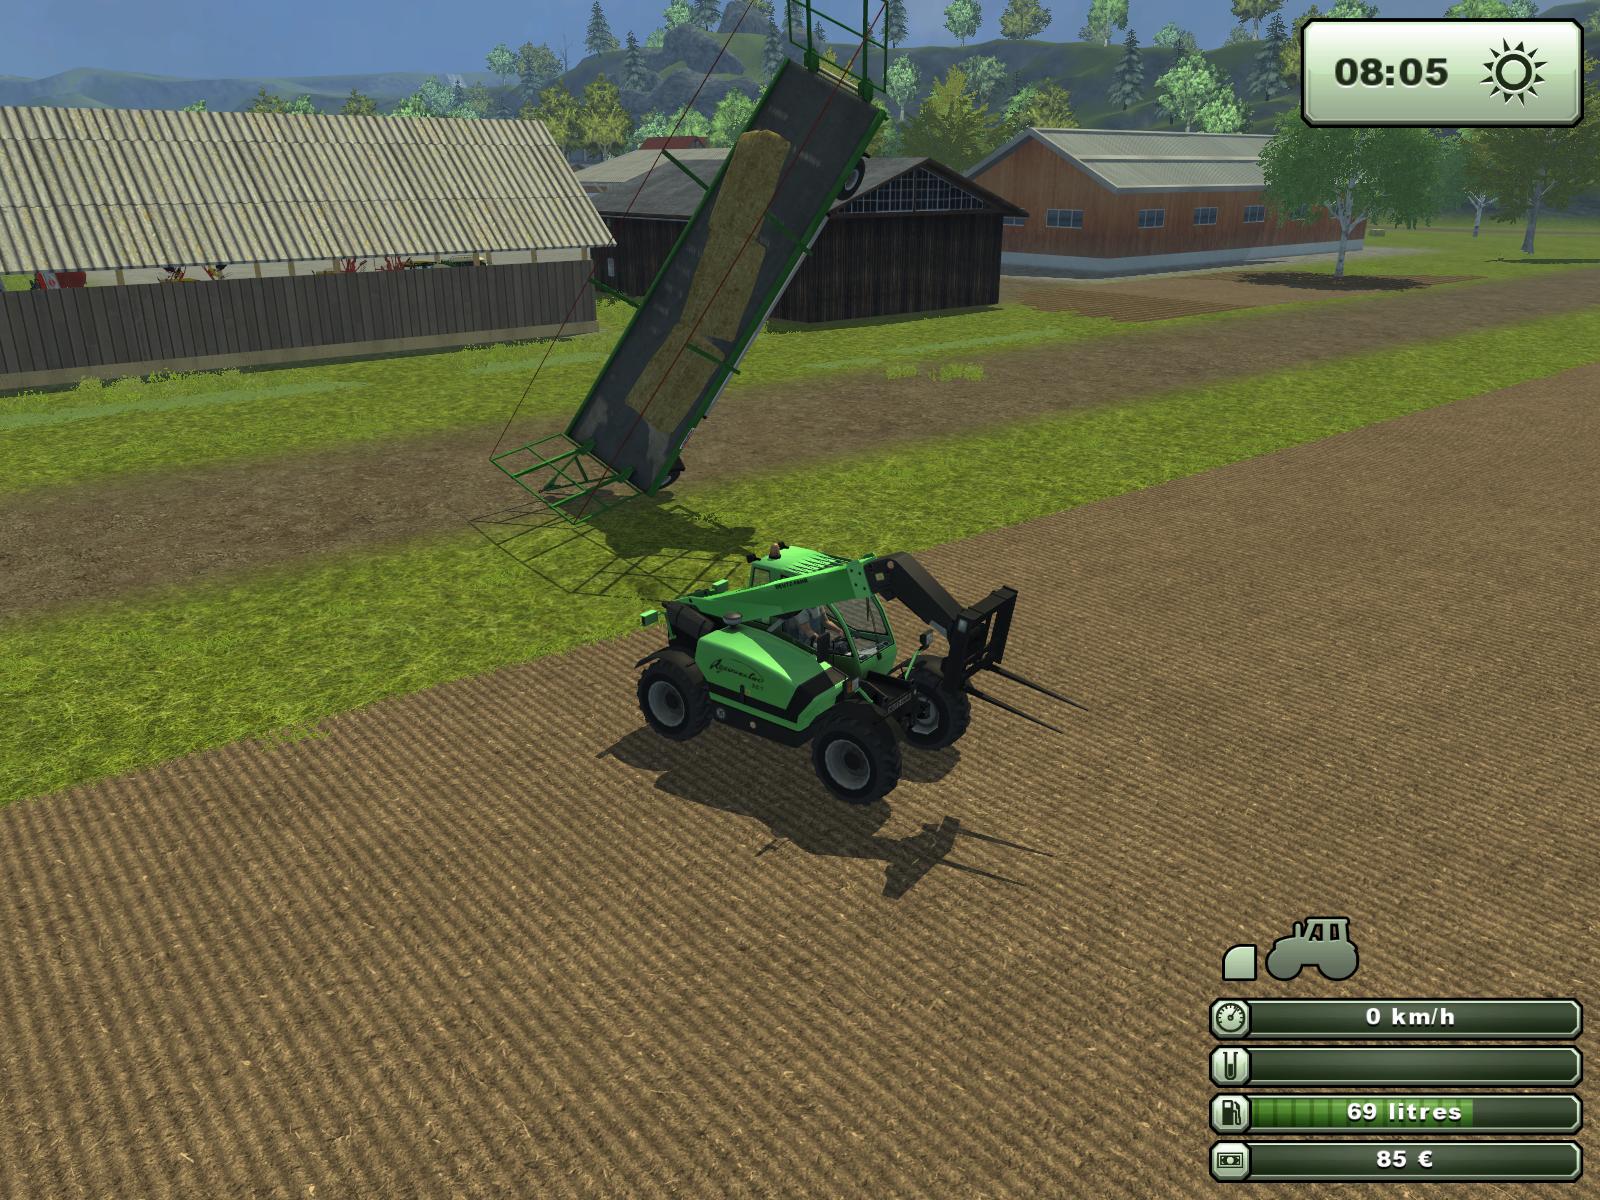 Bales farming simulator 2013 farming simulator wiki fandom powered by wikia